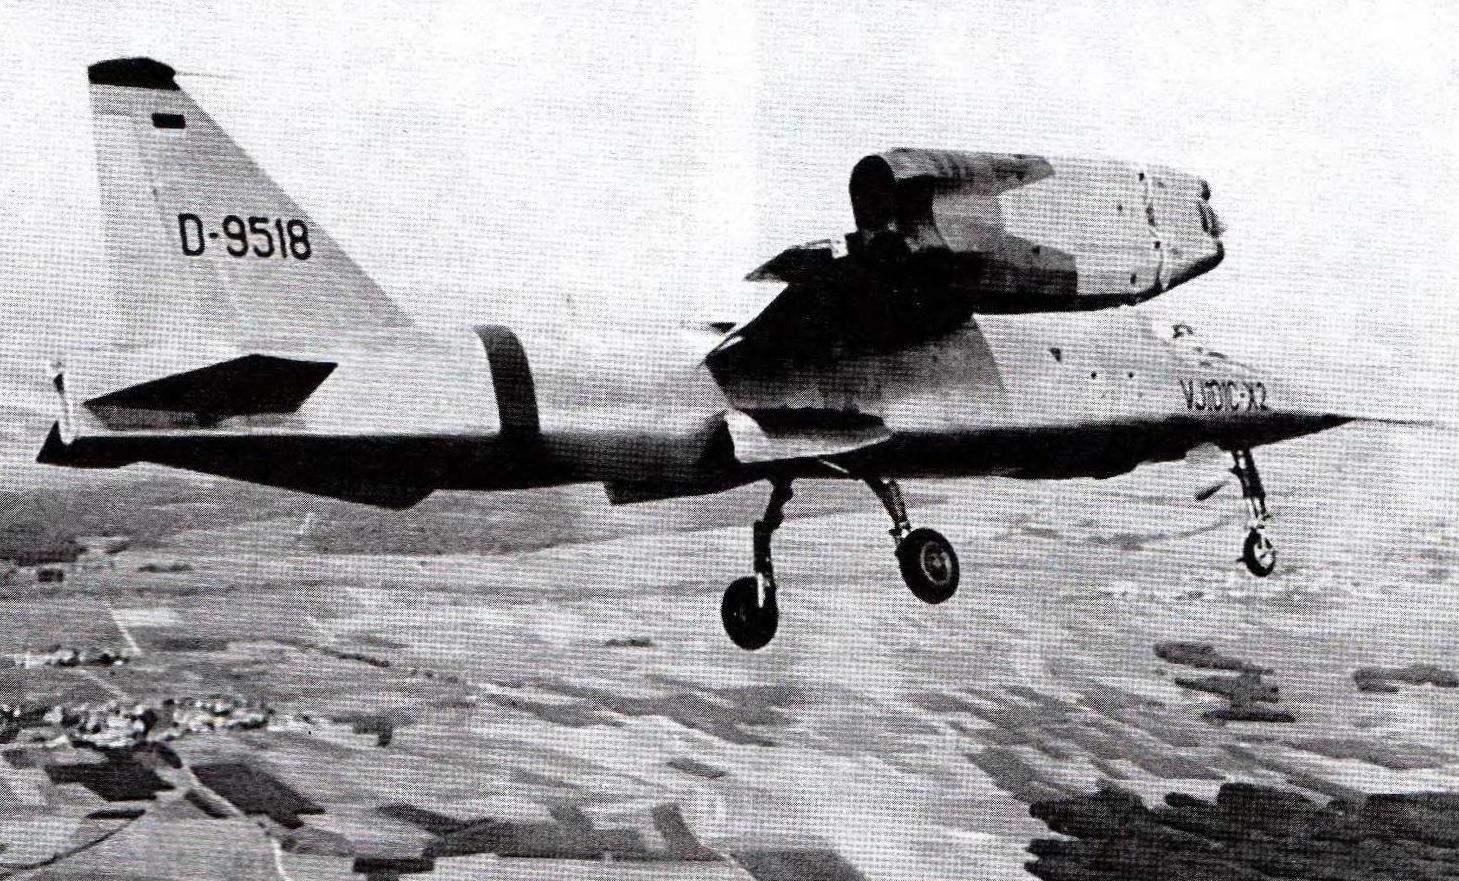 VJ-101 с выпущенным шасси заходит на посадку